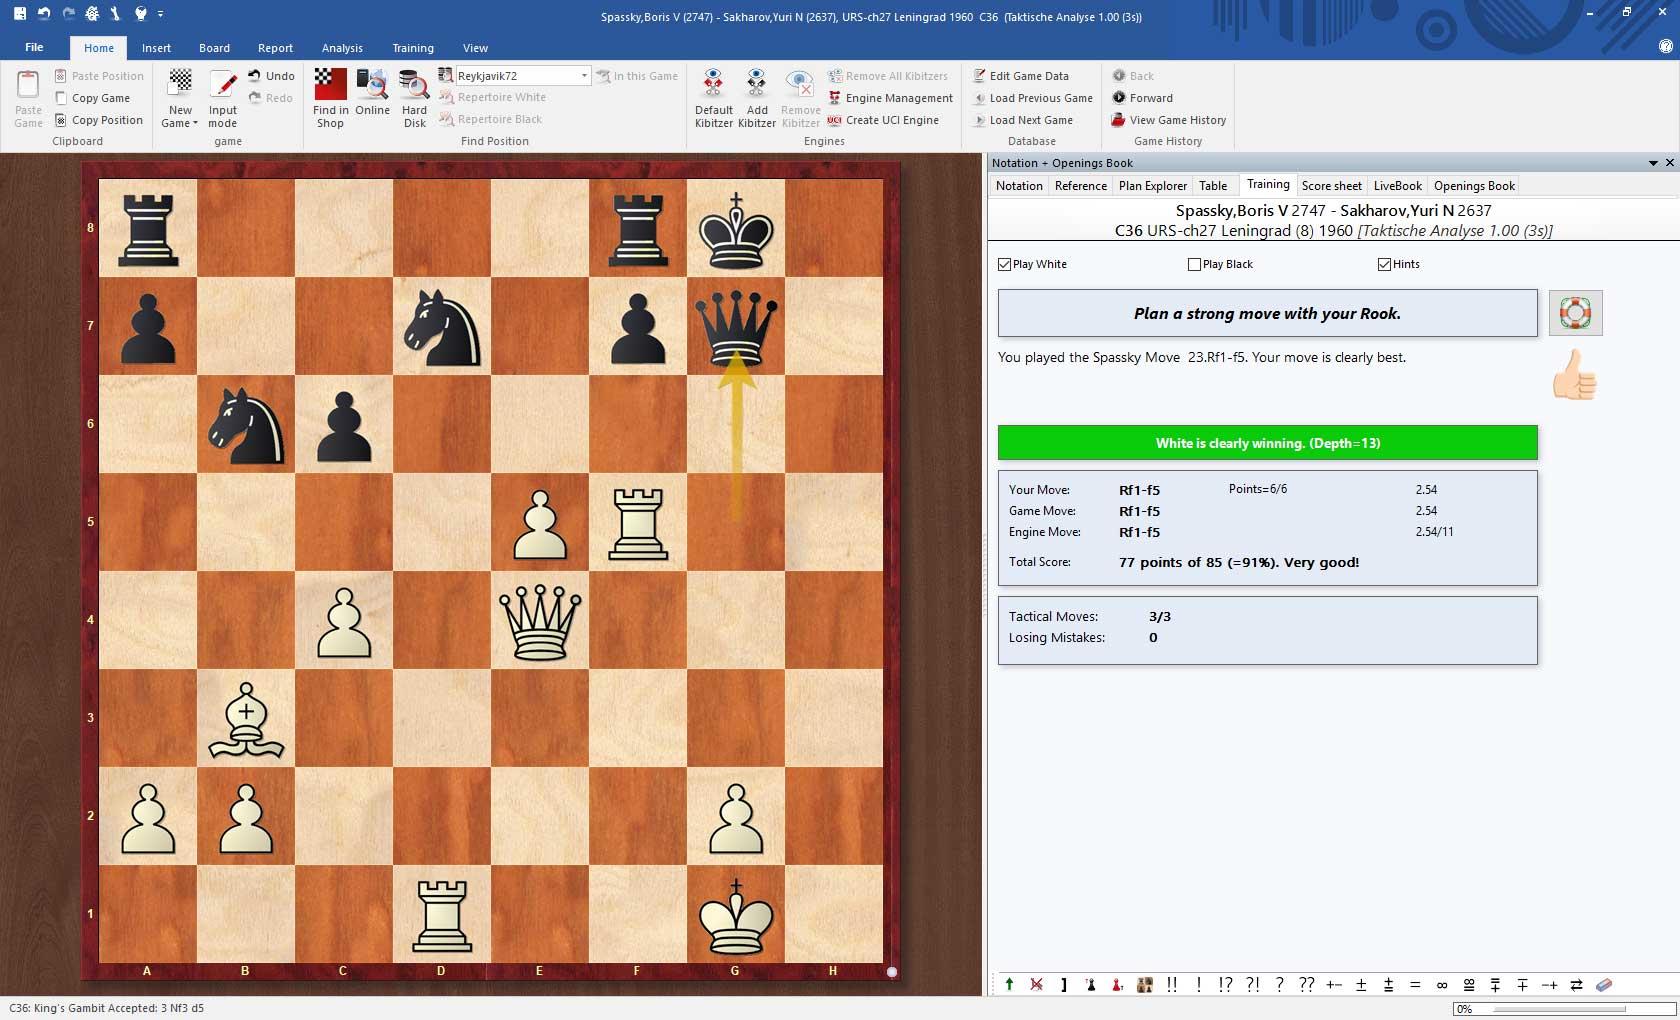 Replay Training in ChessBase 15